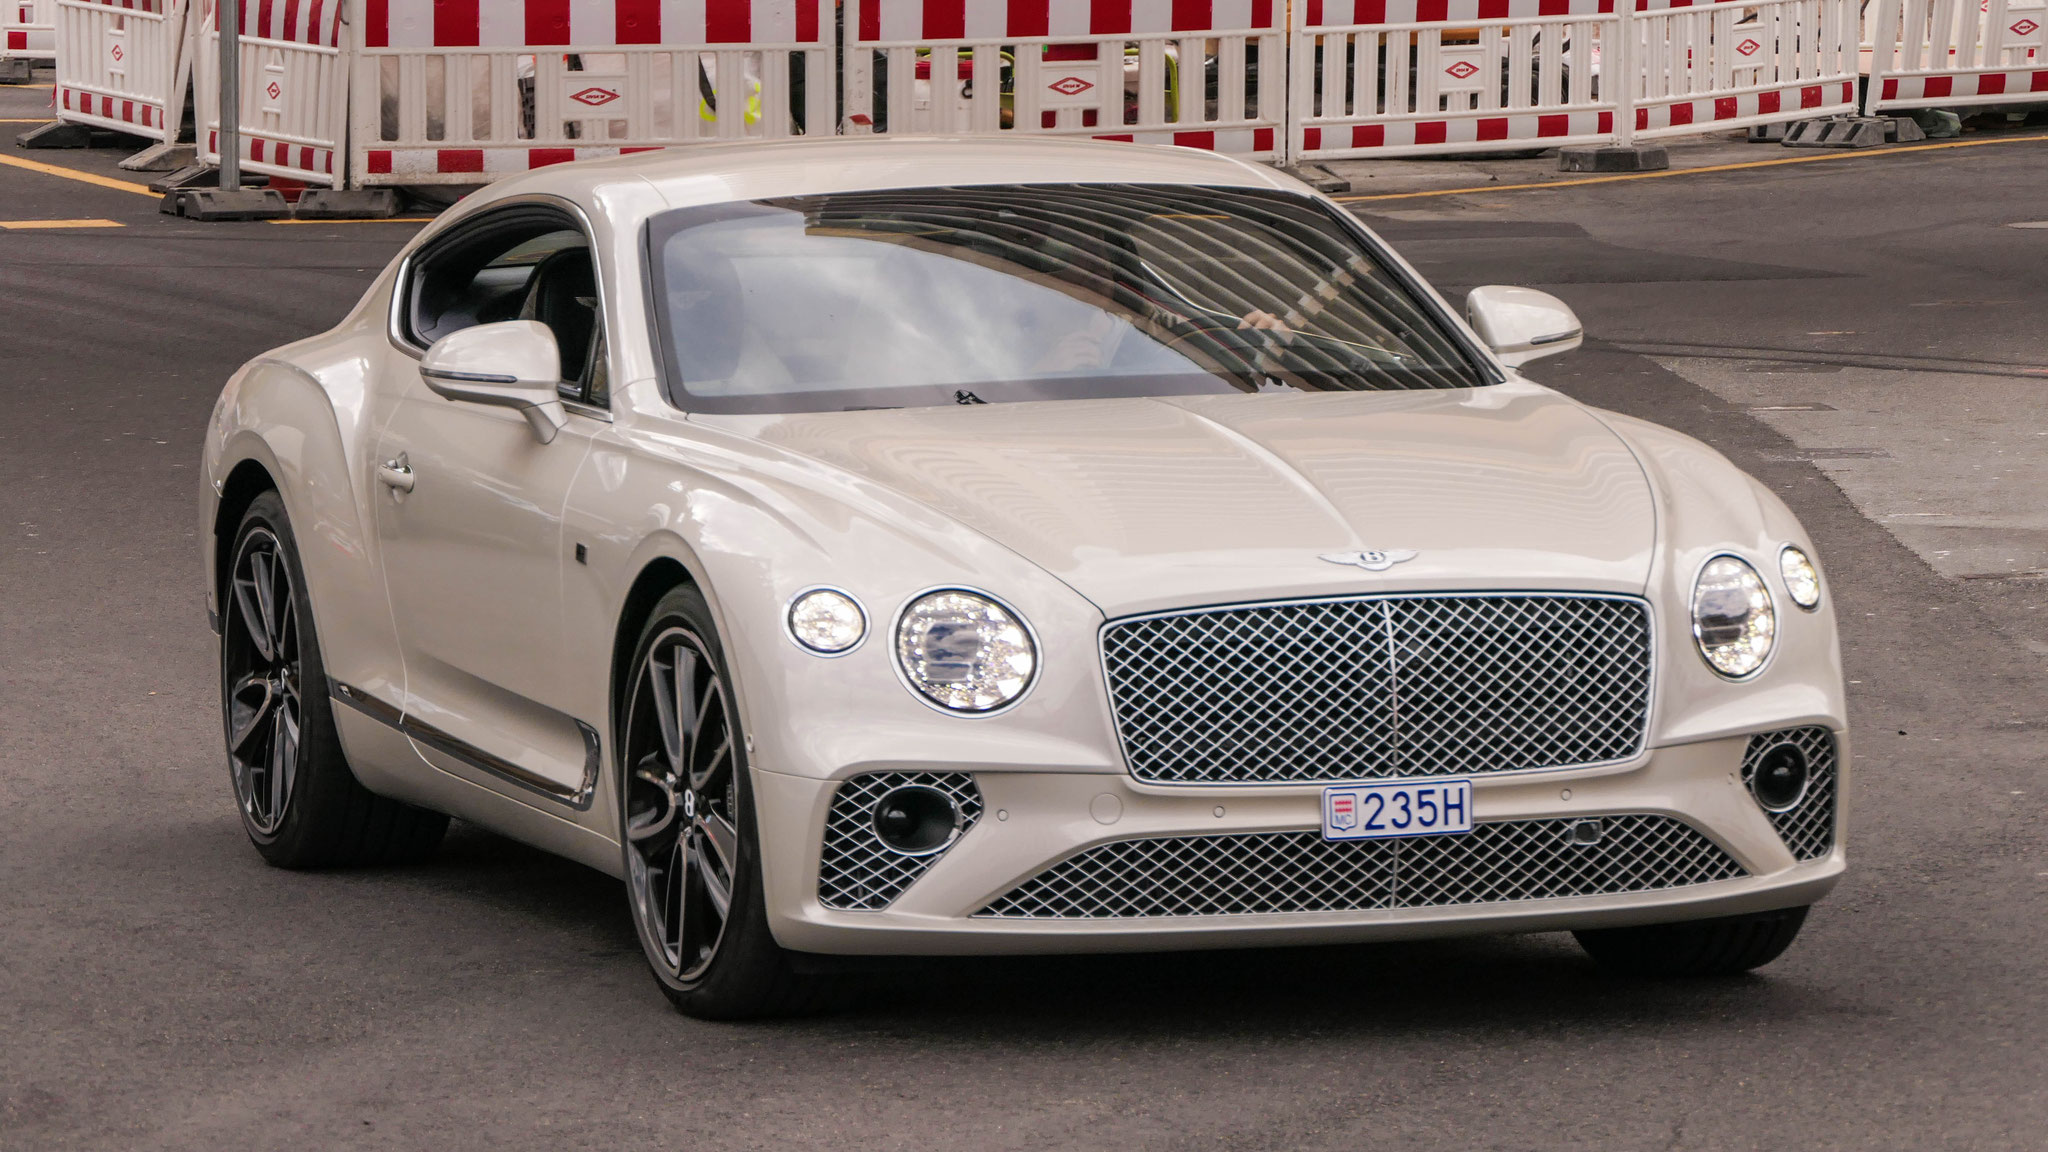 Bentley Continental GT - 235H (MC)